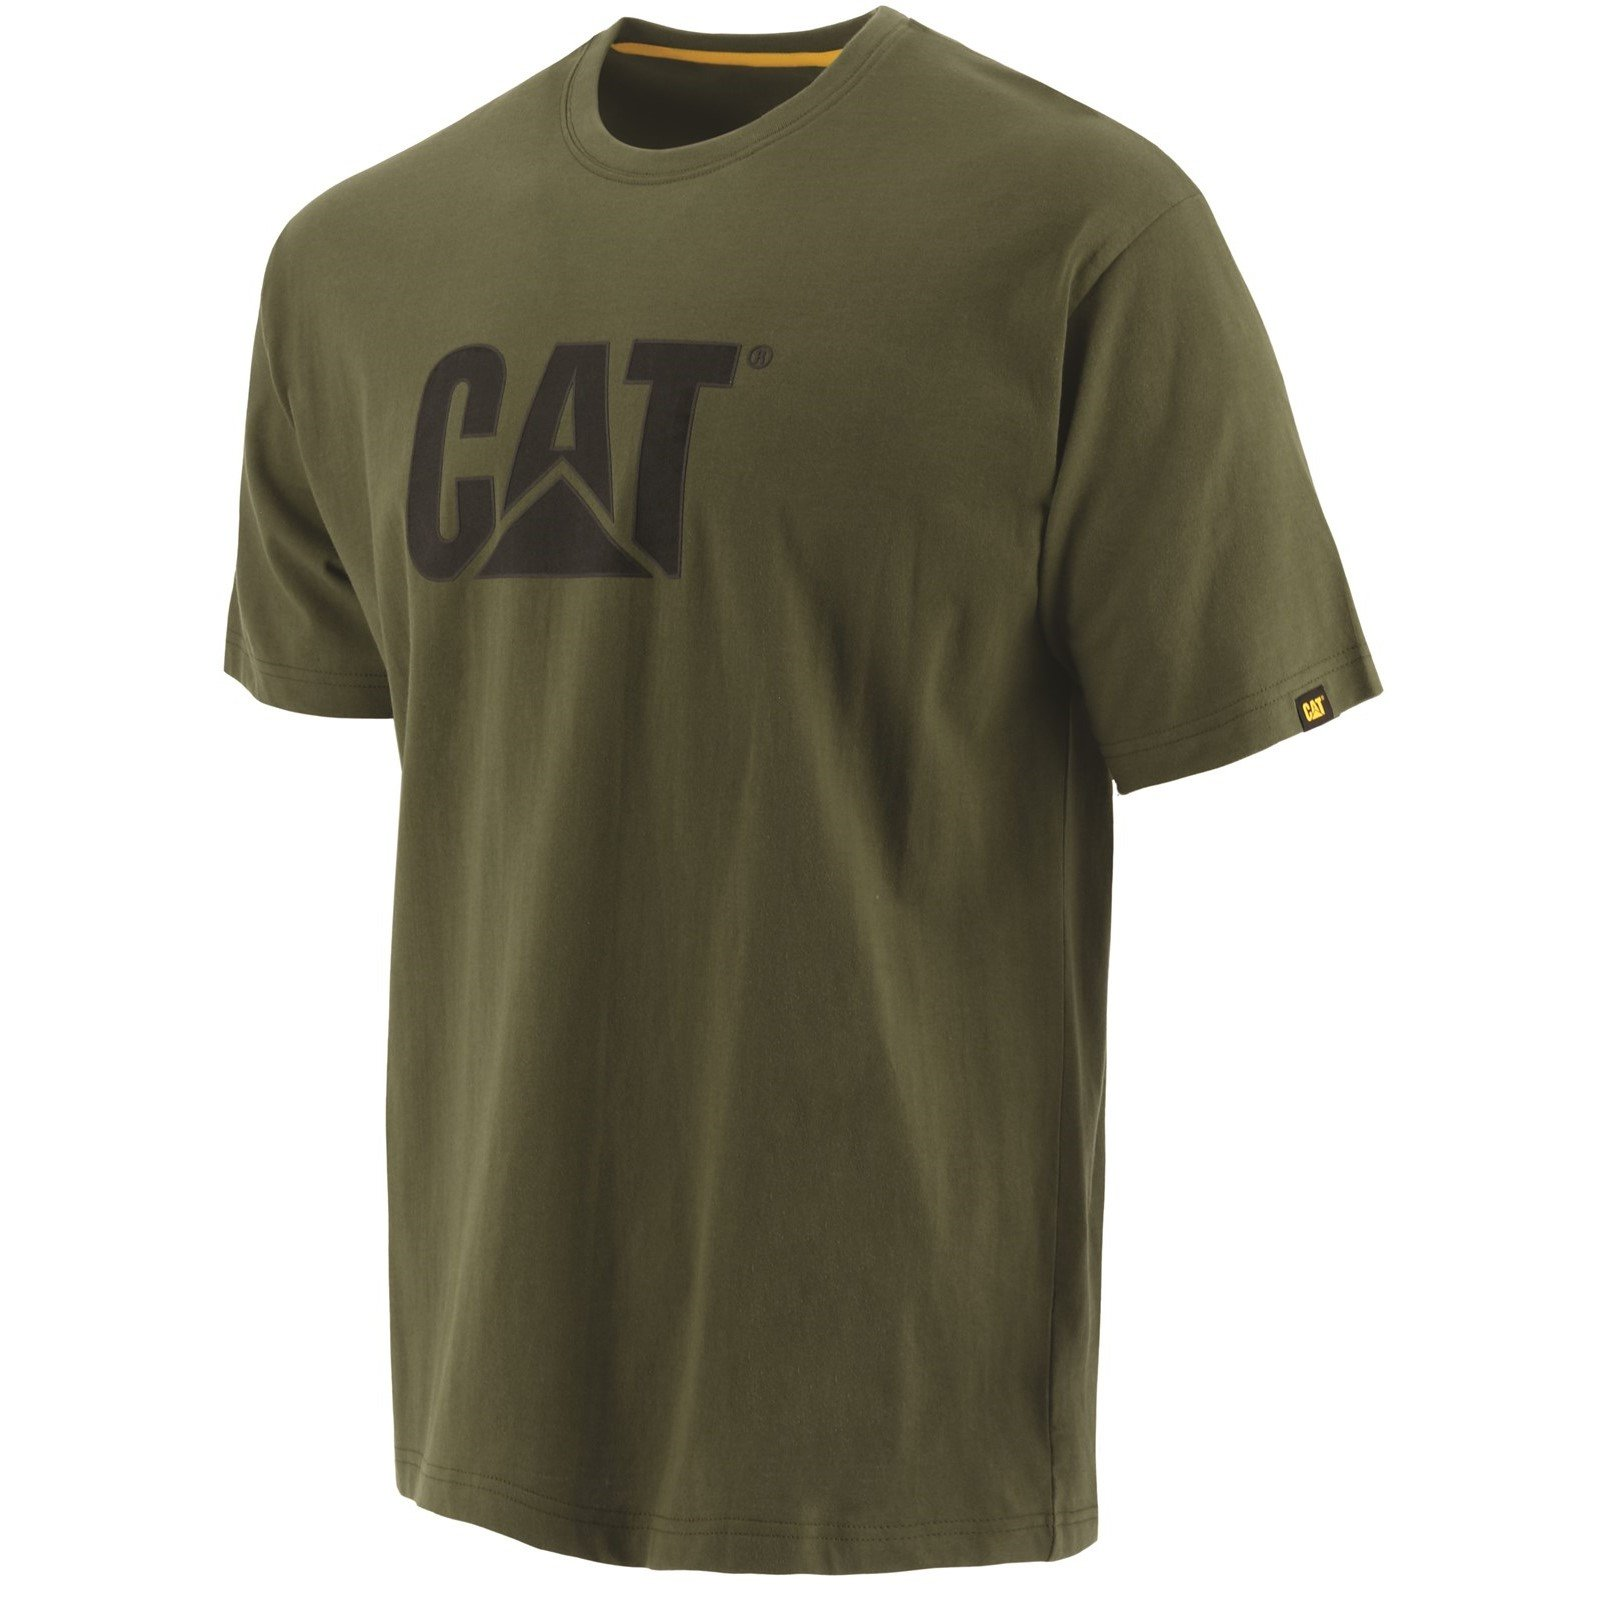 Caterpillar Men's Trademark Logo T-Shirt Various Colours 25301-42086 - Chive 3X